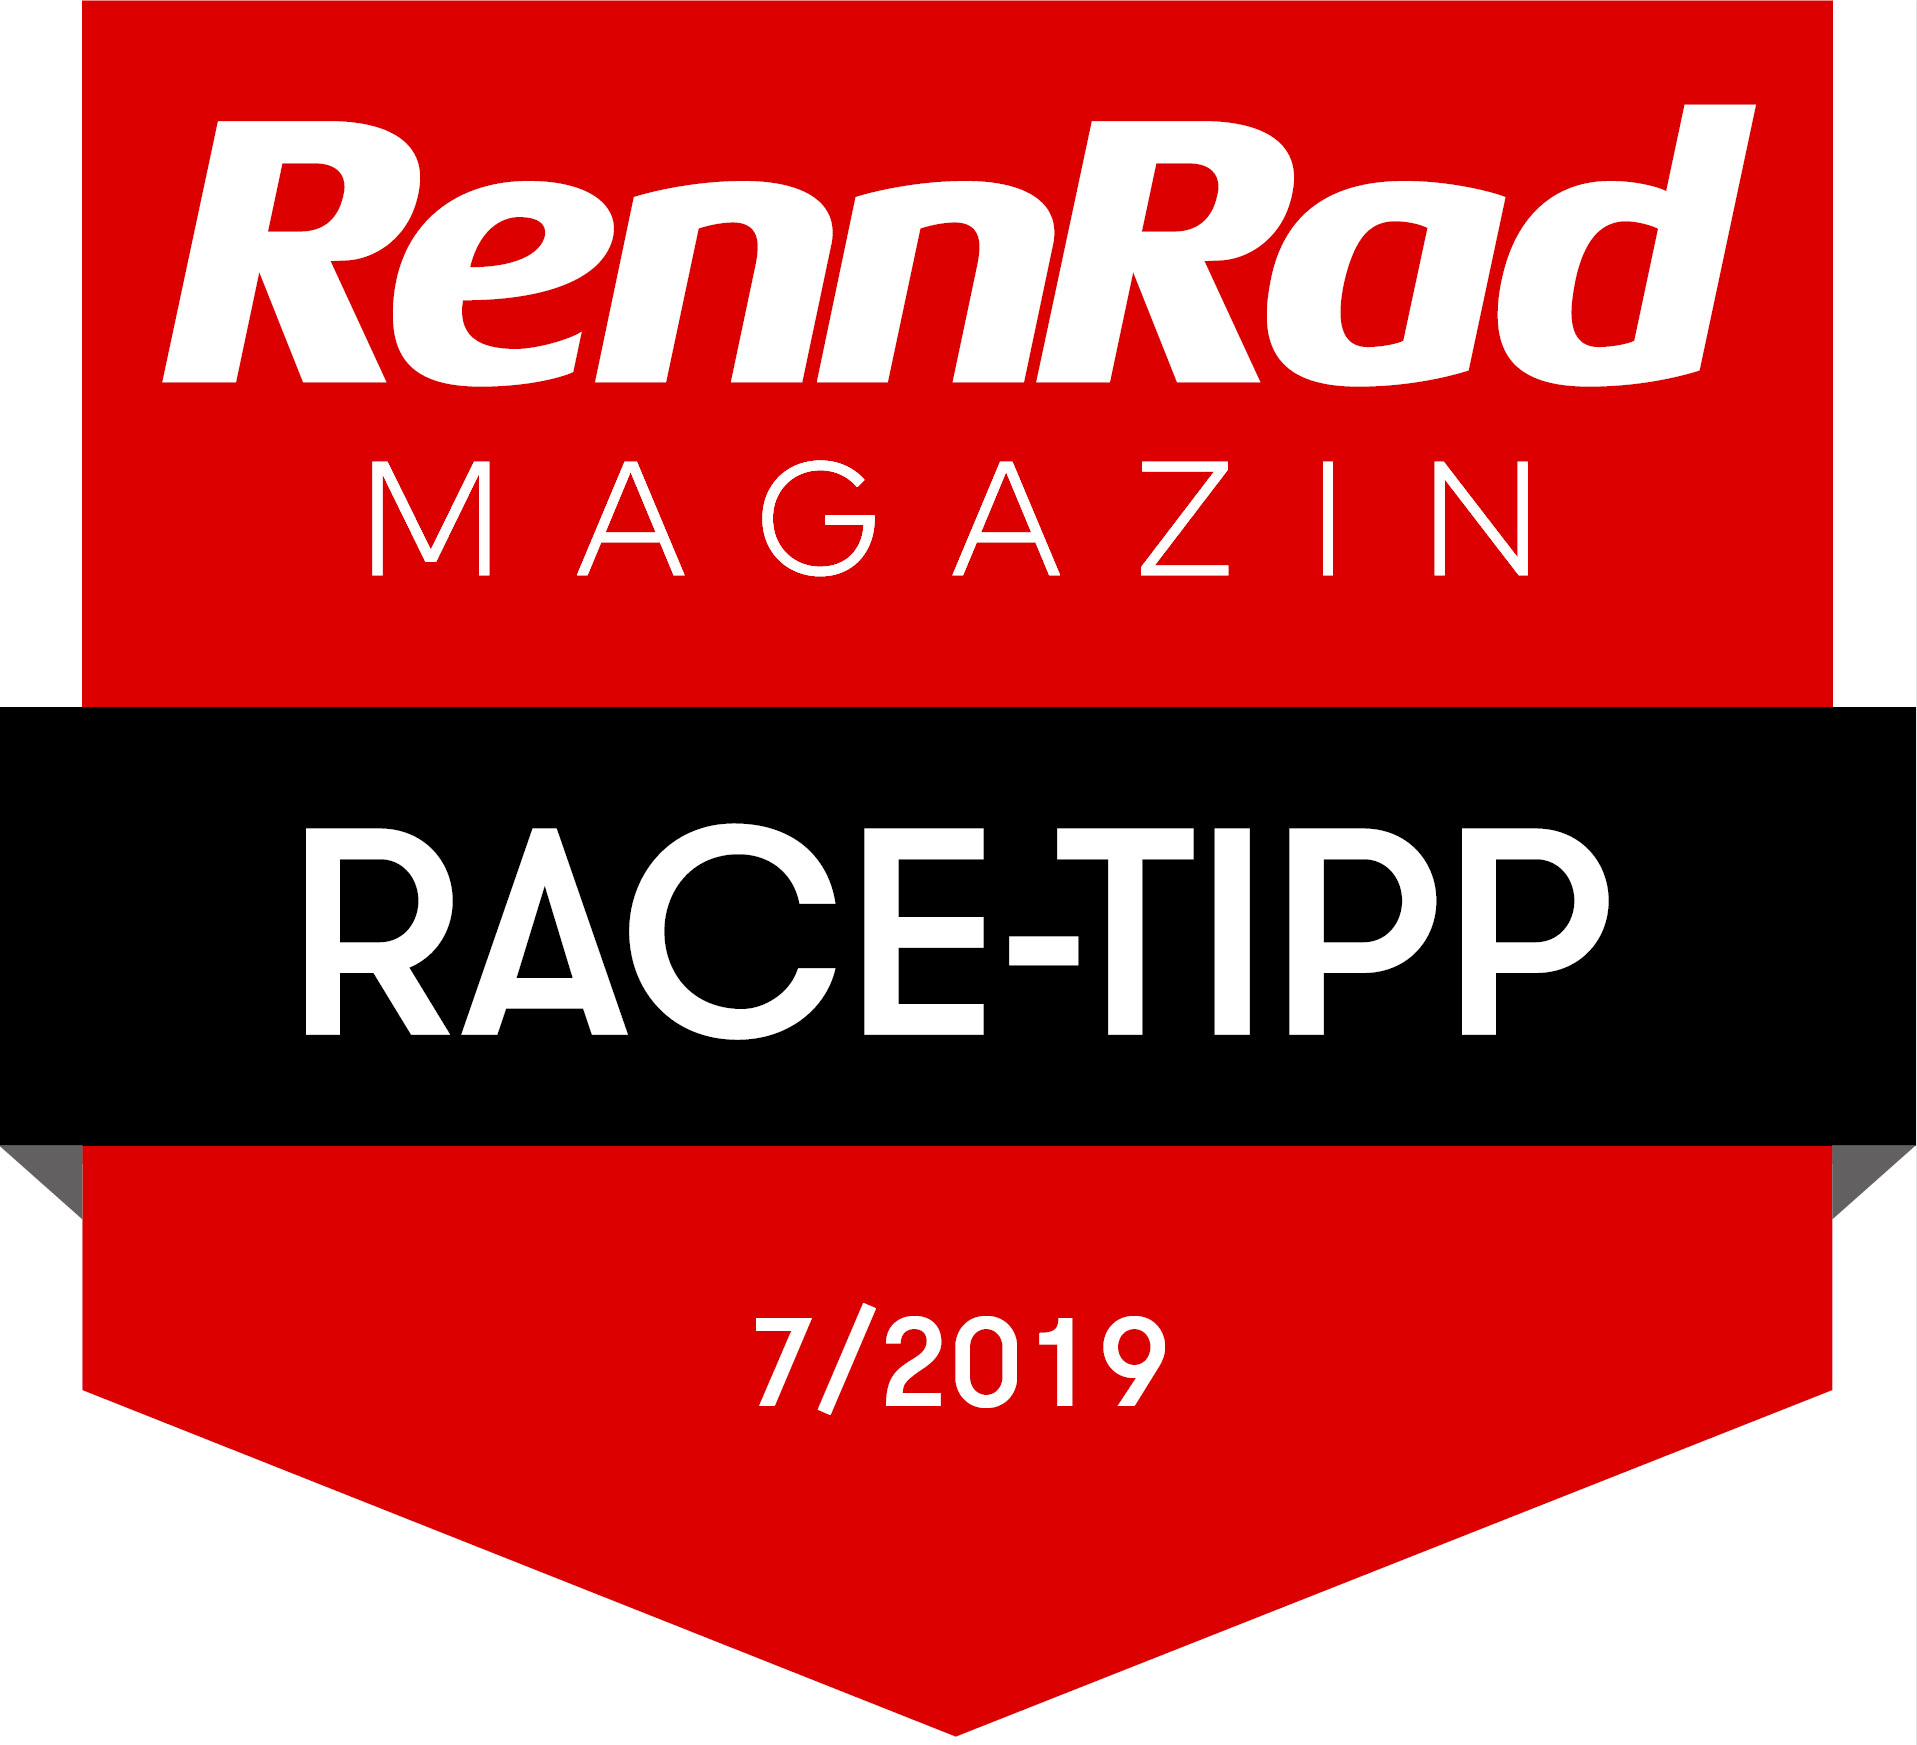 race-tipp